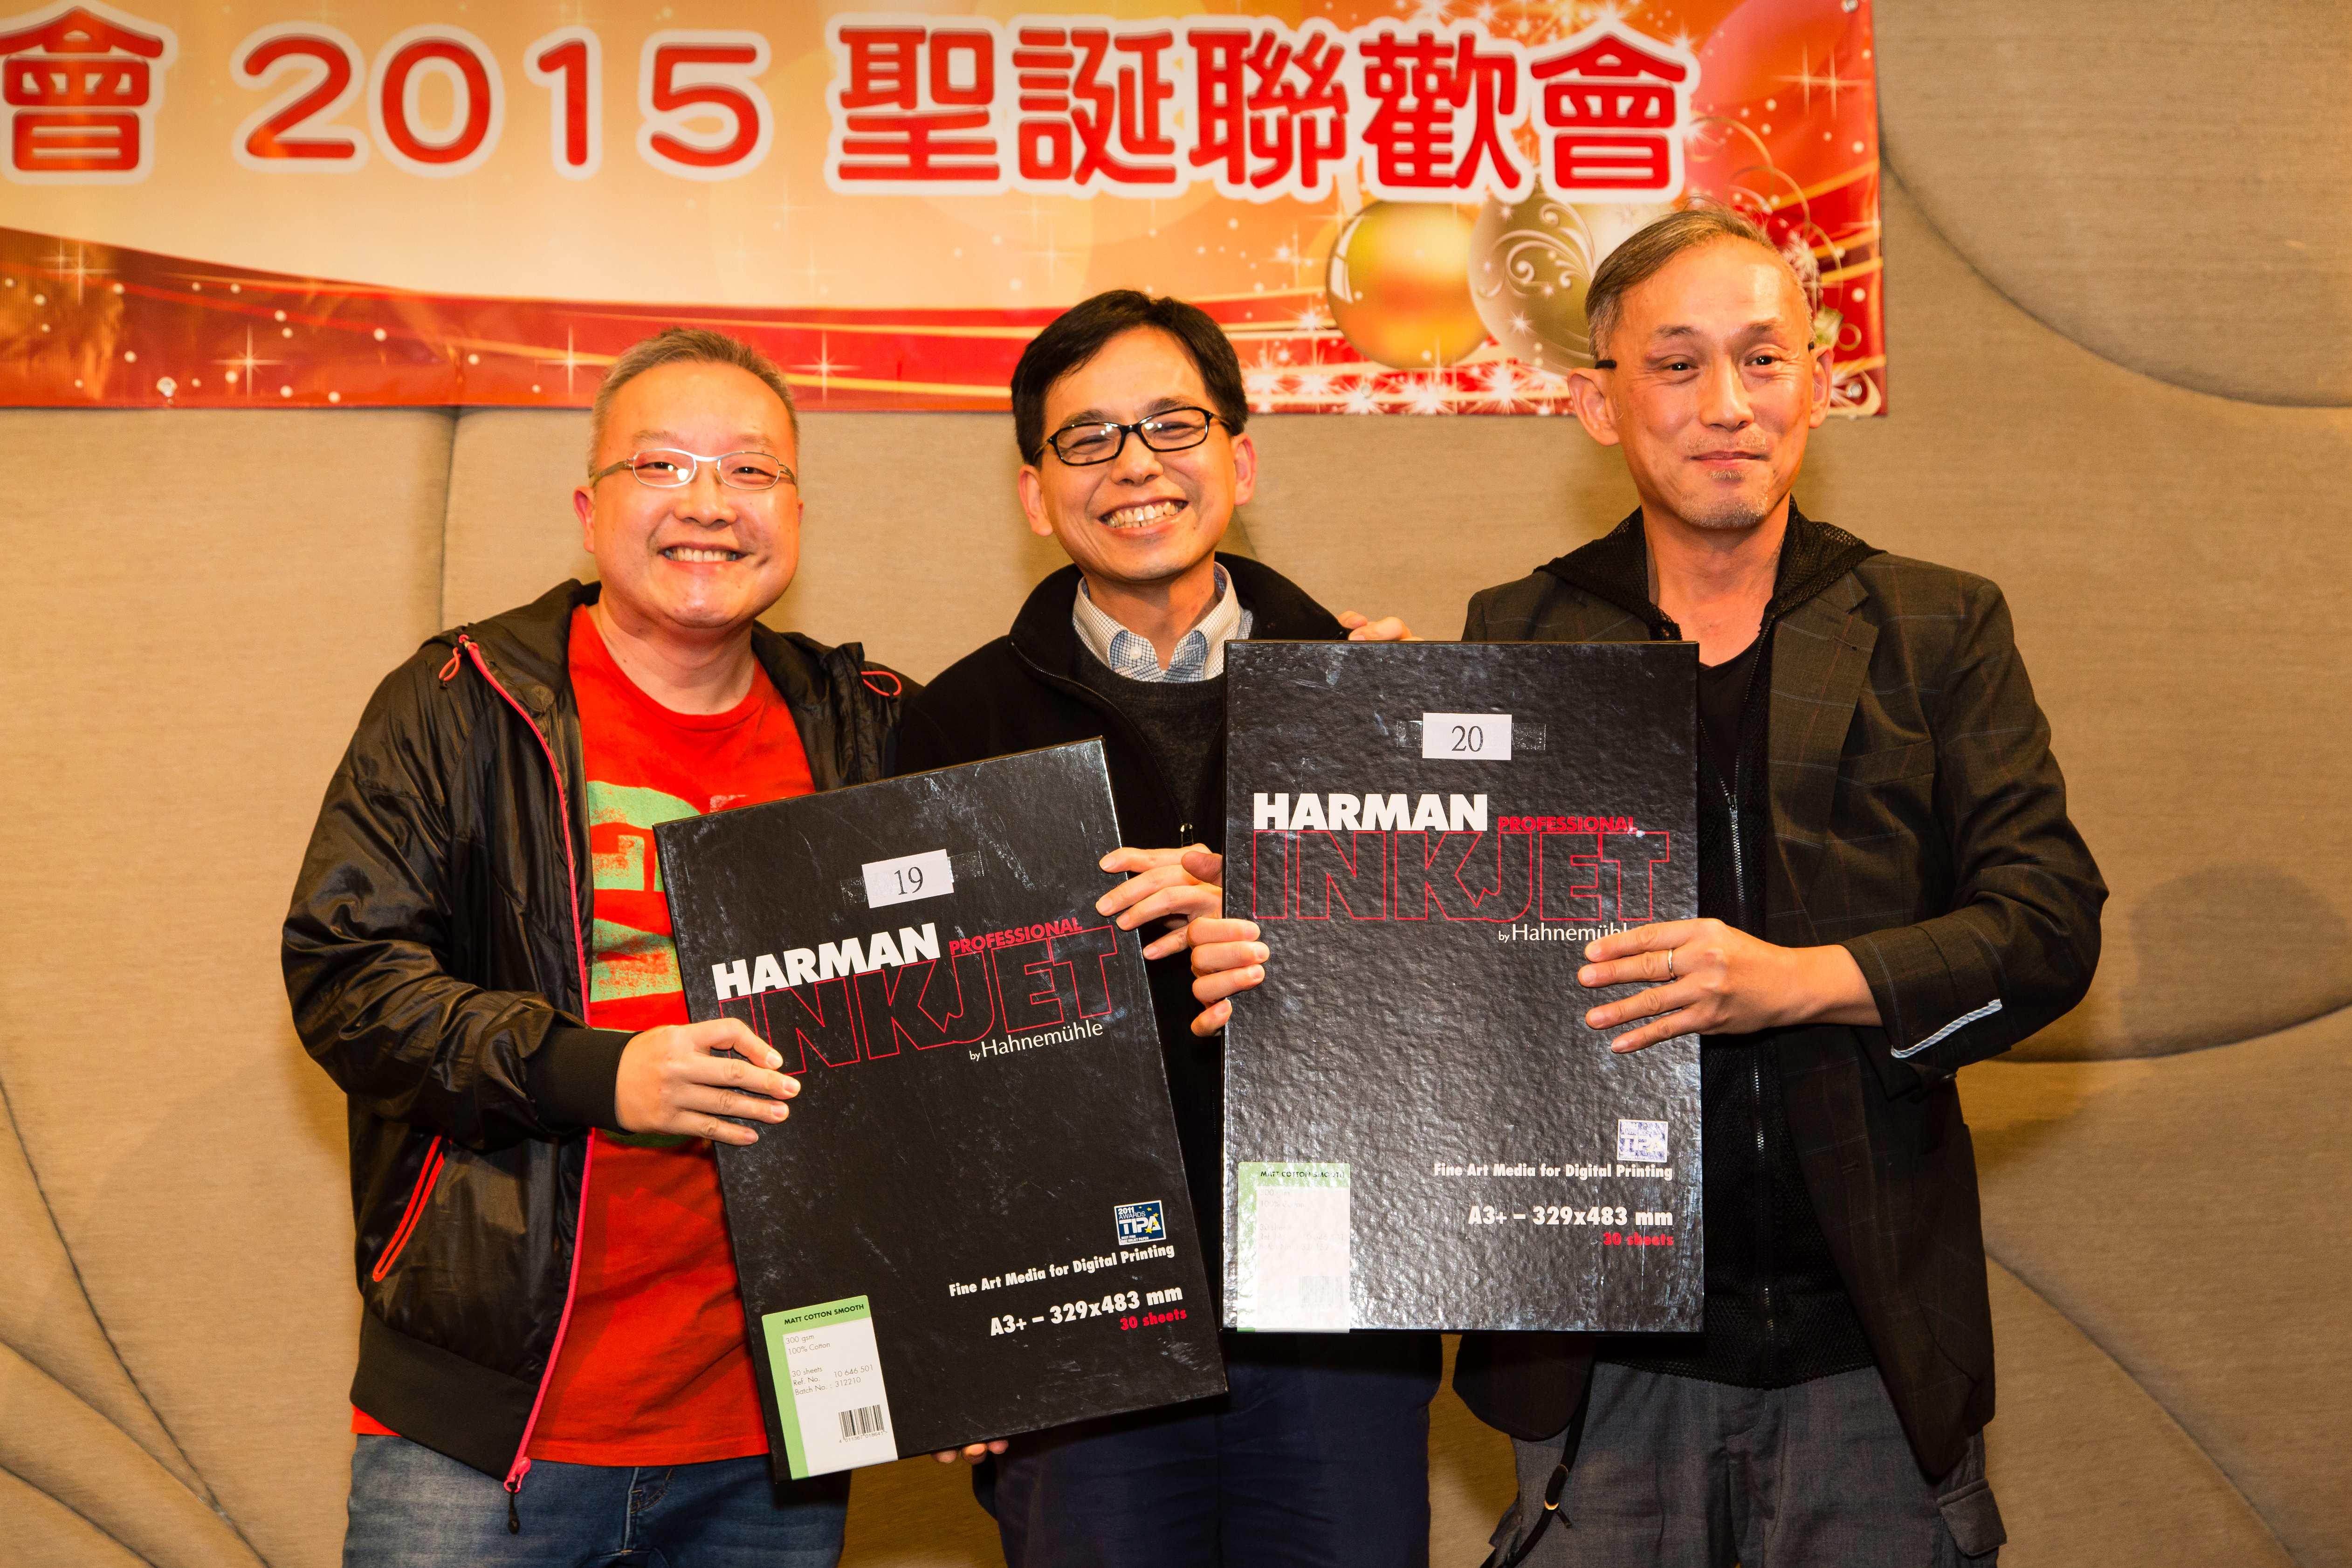 HKIPP X'MASHKIPP2015-0152